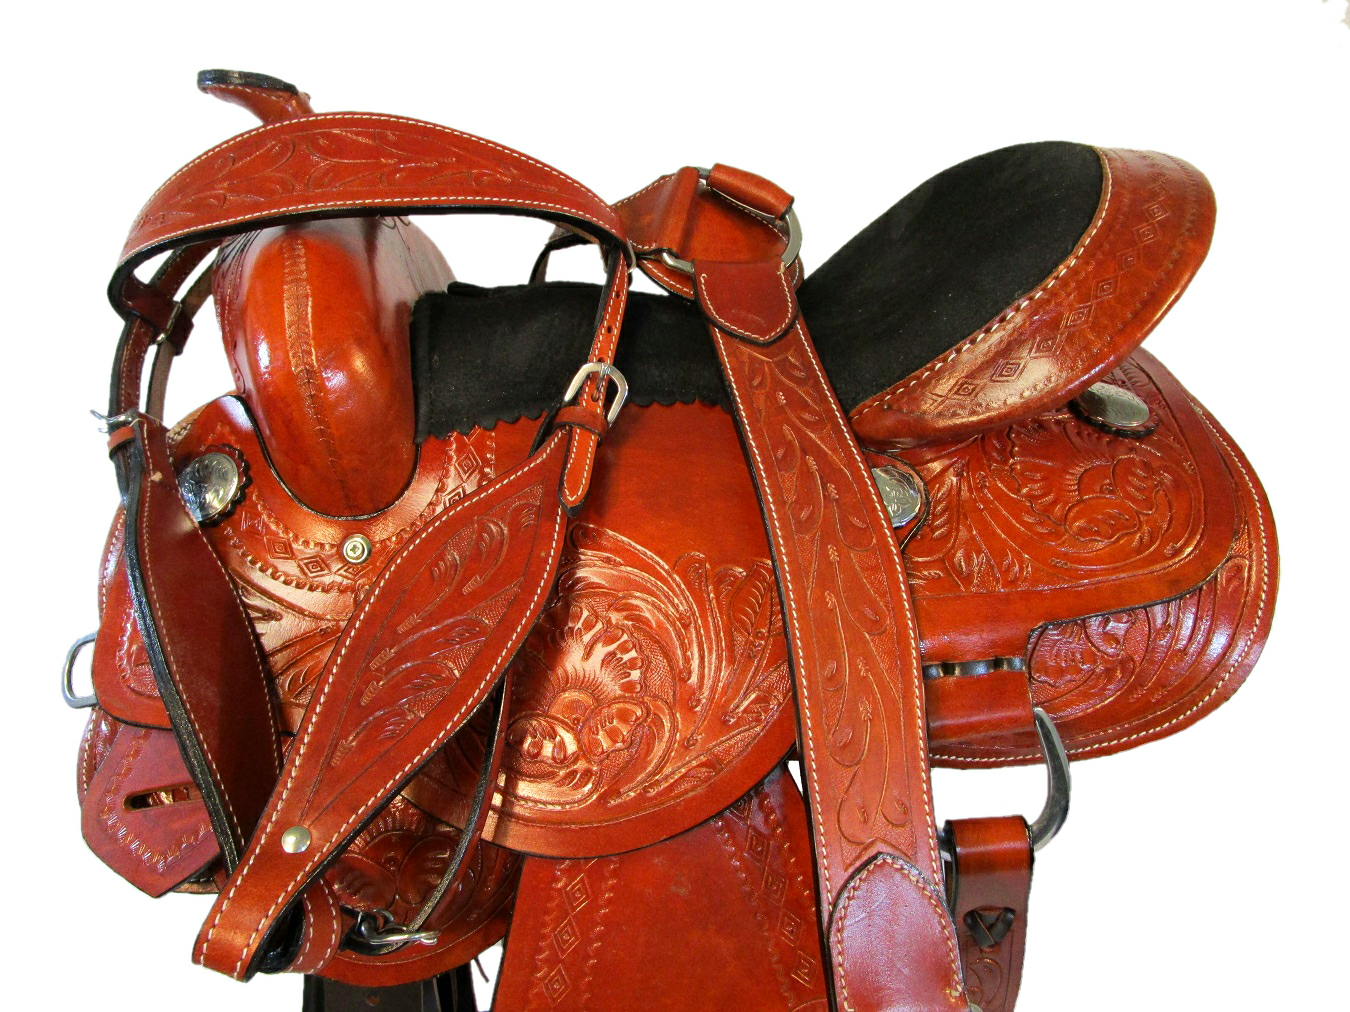 15 16 WESTERN SHOW BARREL Marronee HORSE PLEASURE Marronee RACING SADDLE TRAIL